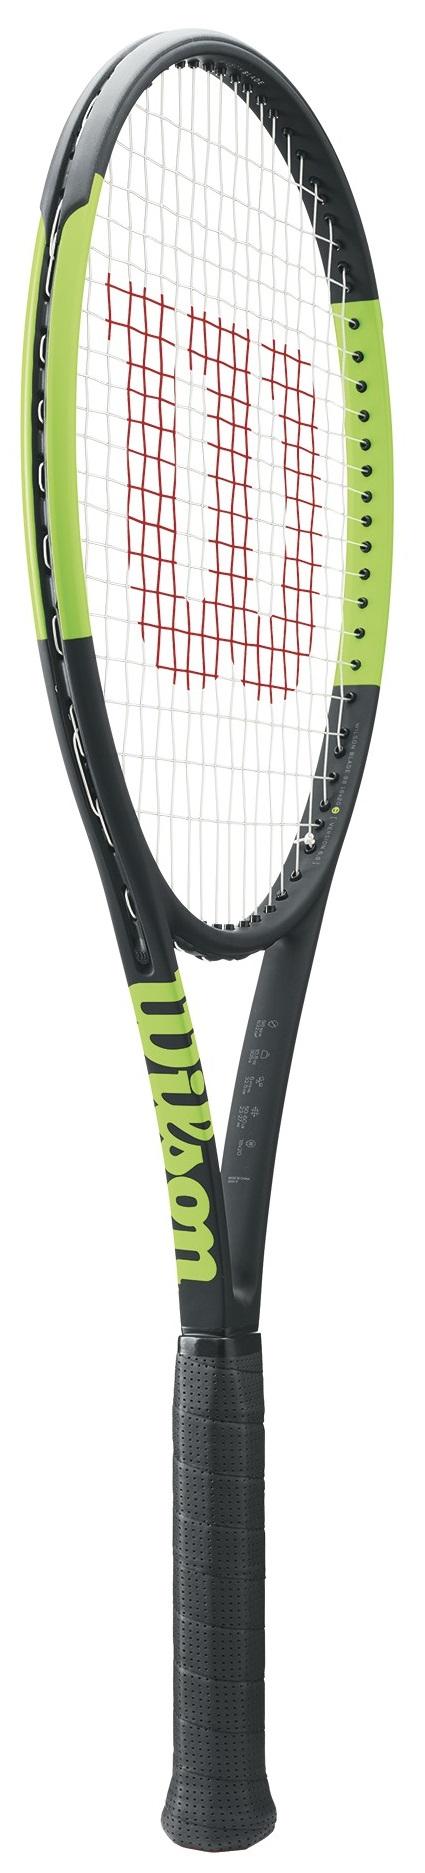 WILSON BLADE 98S tenisa rakete